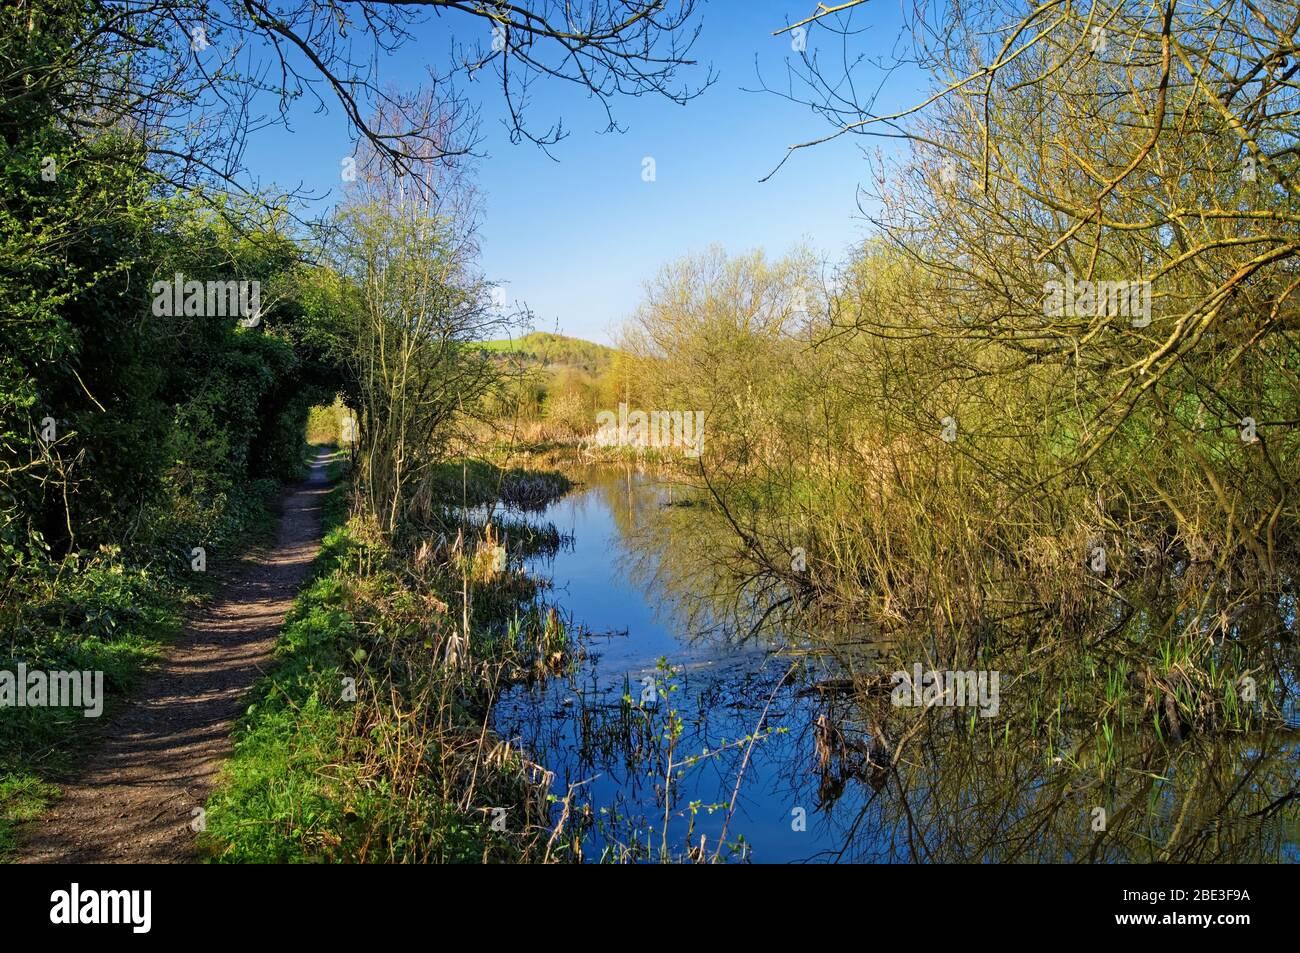 UK, South Yorkshire, Barnsley, Elsecar Canal und Fußweg Stockfoto